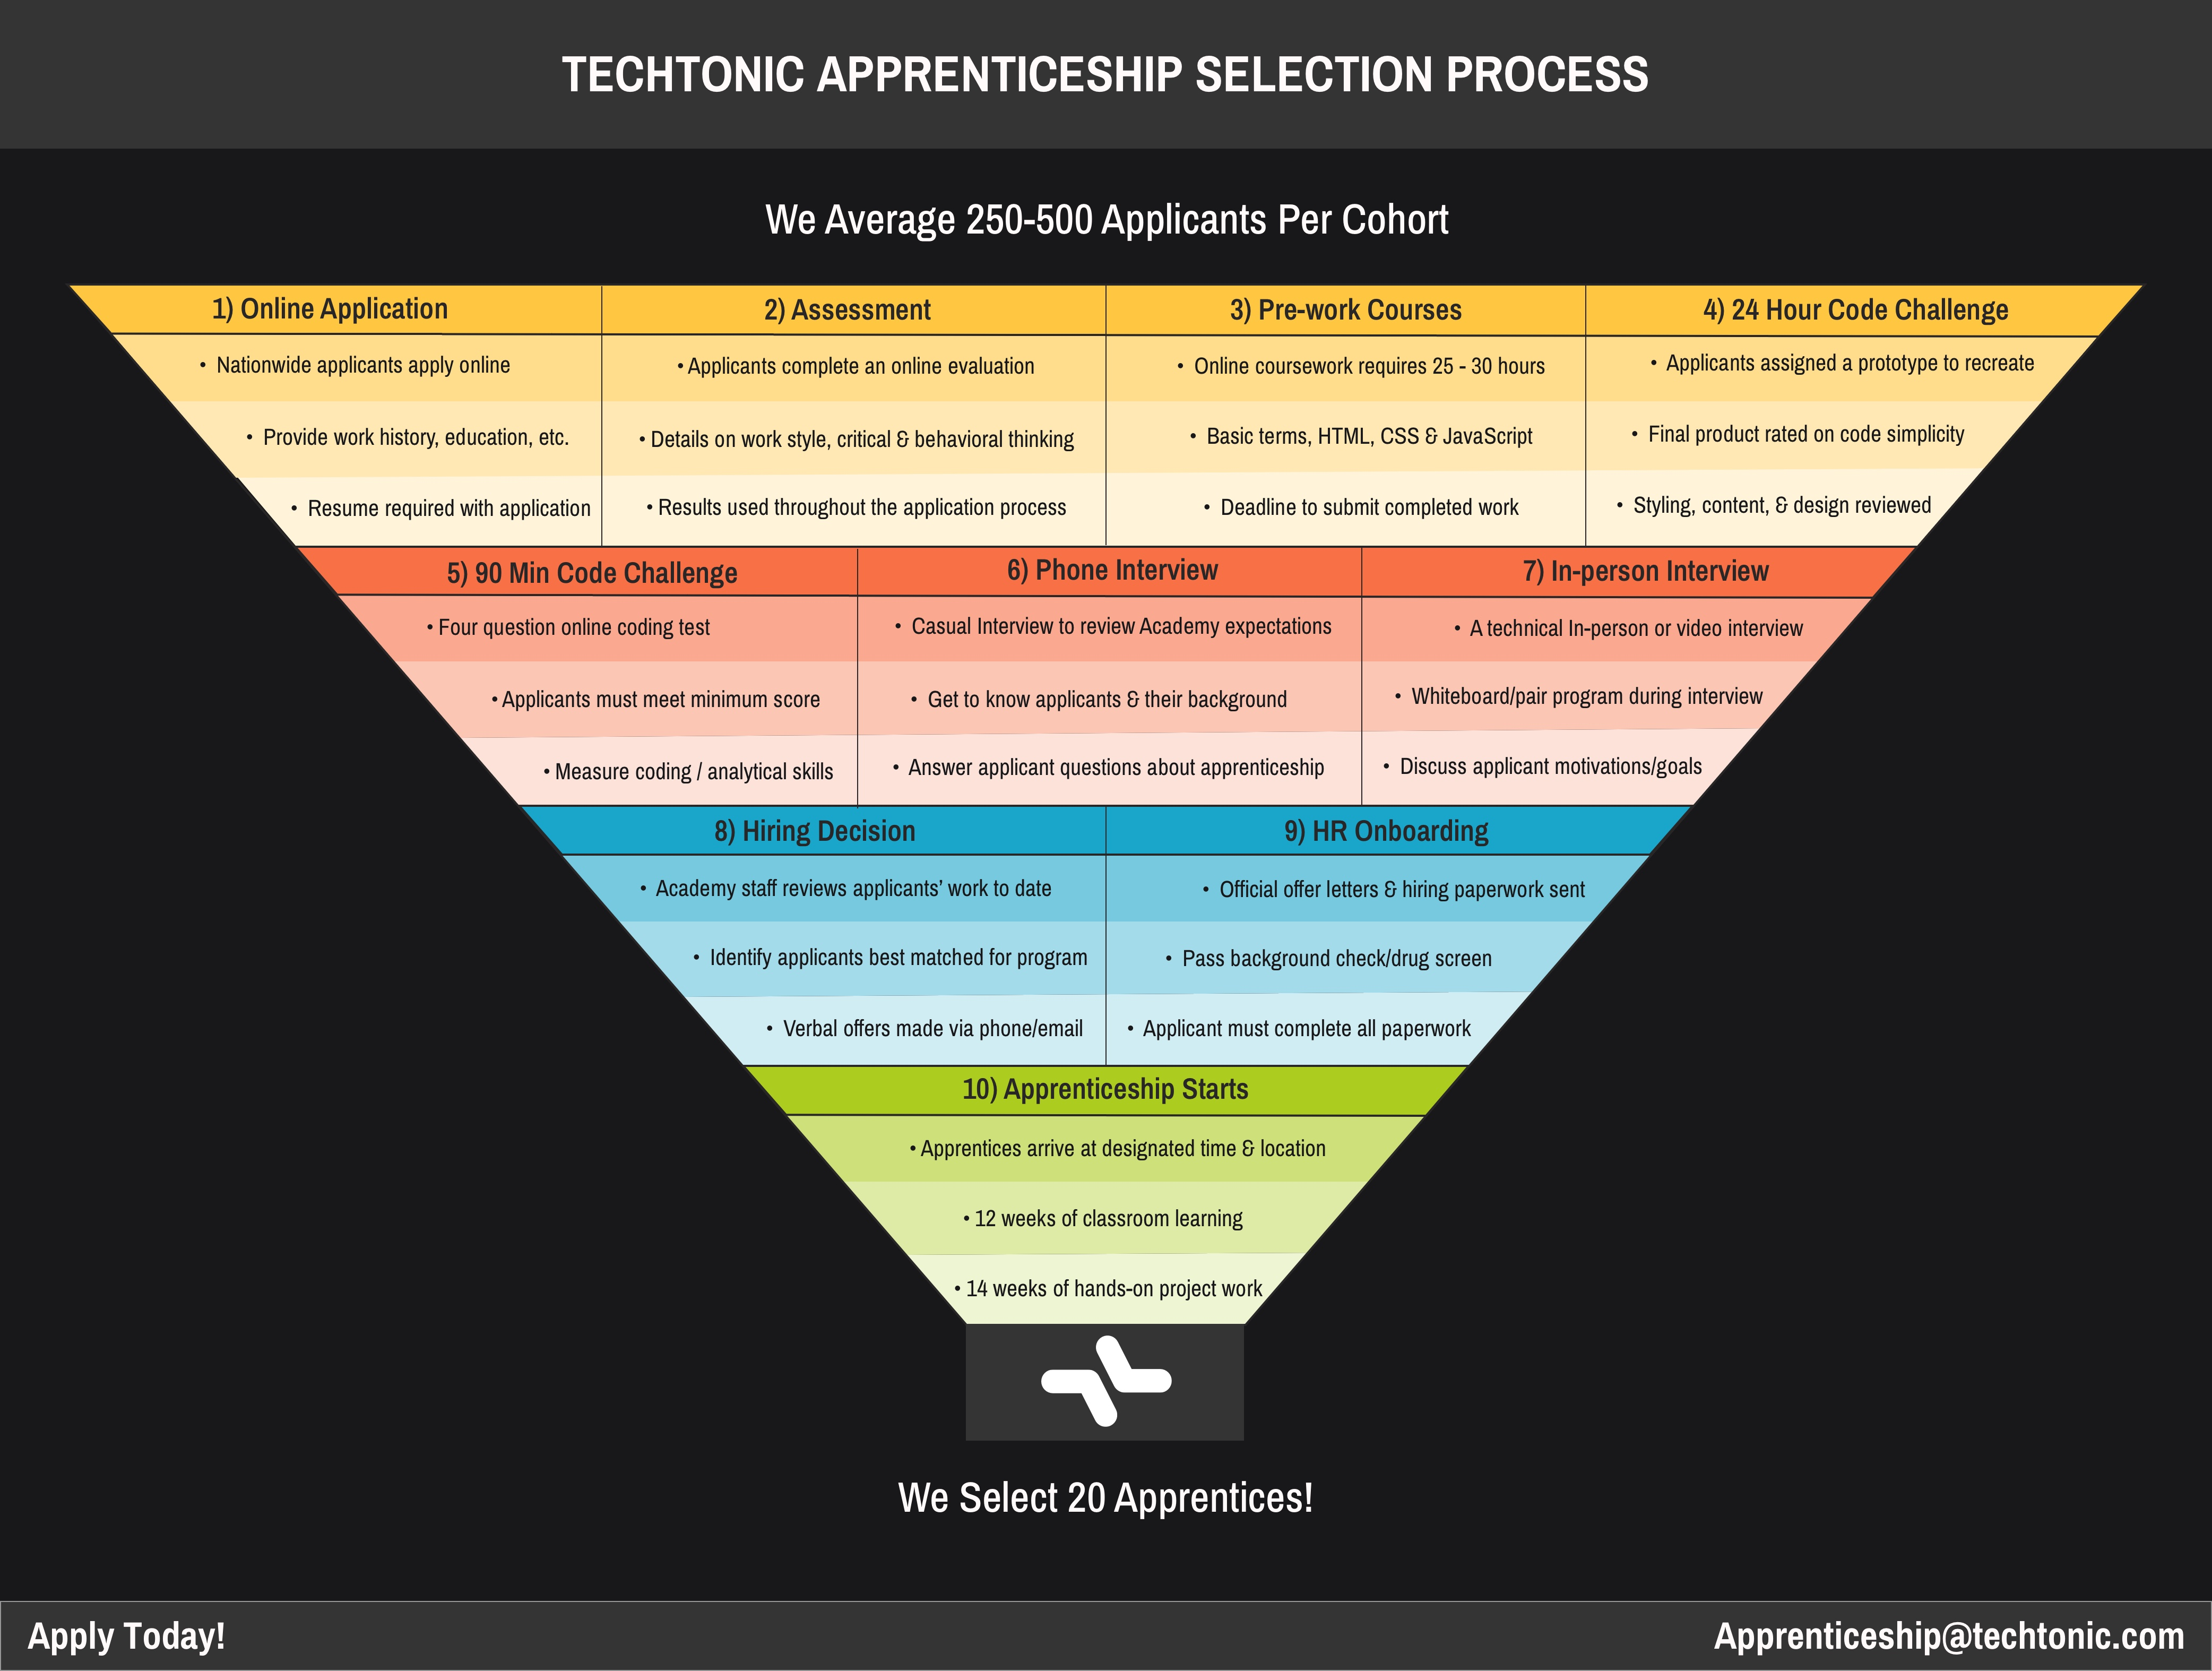 Techtonic Apprenticeship Application Process